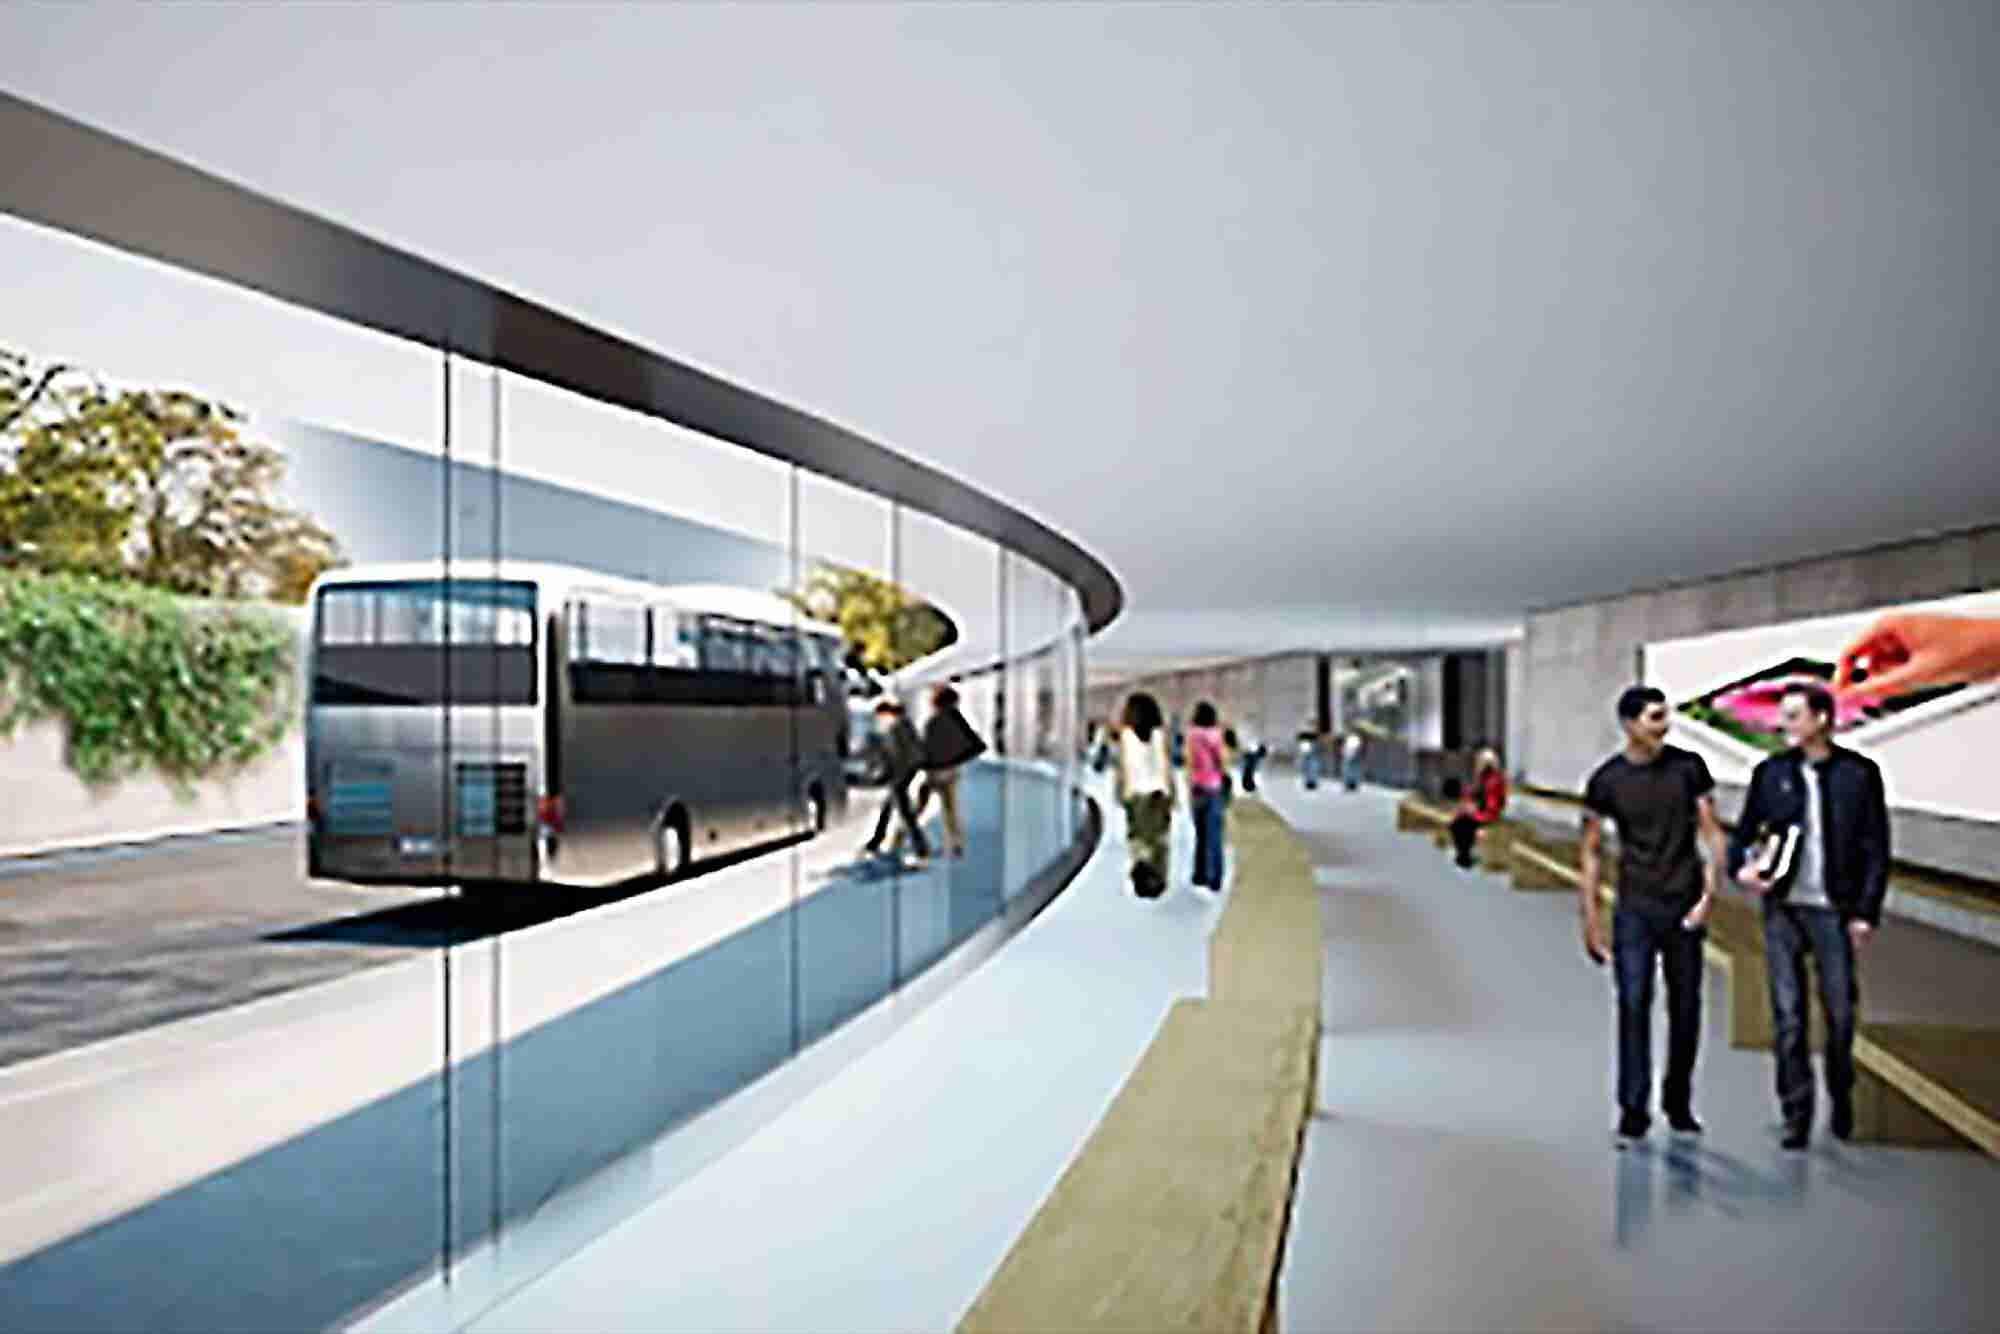 New Images of Apple's 'Spaceship' Headquarters in California